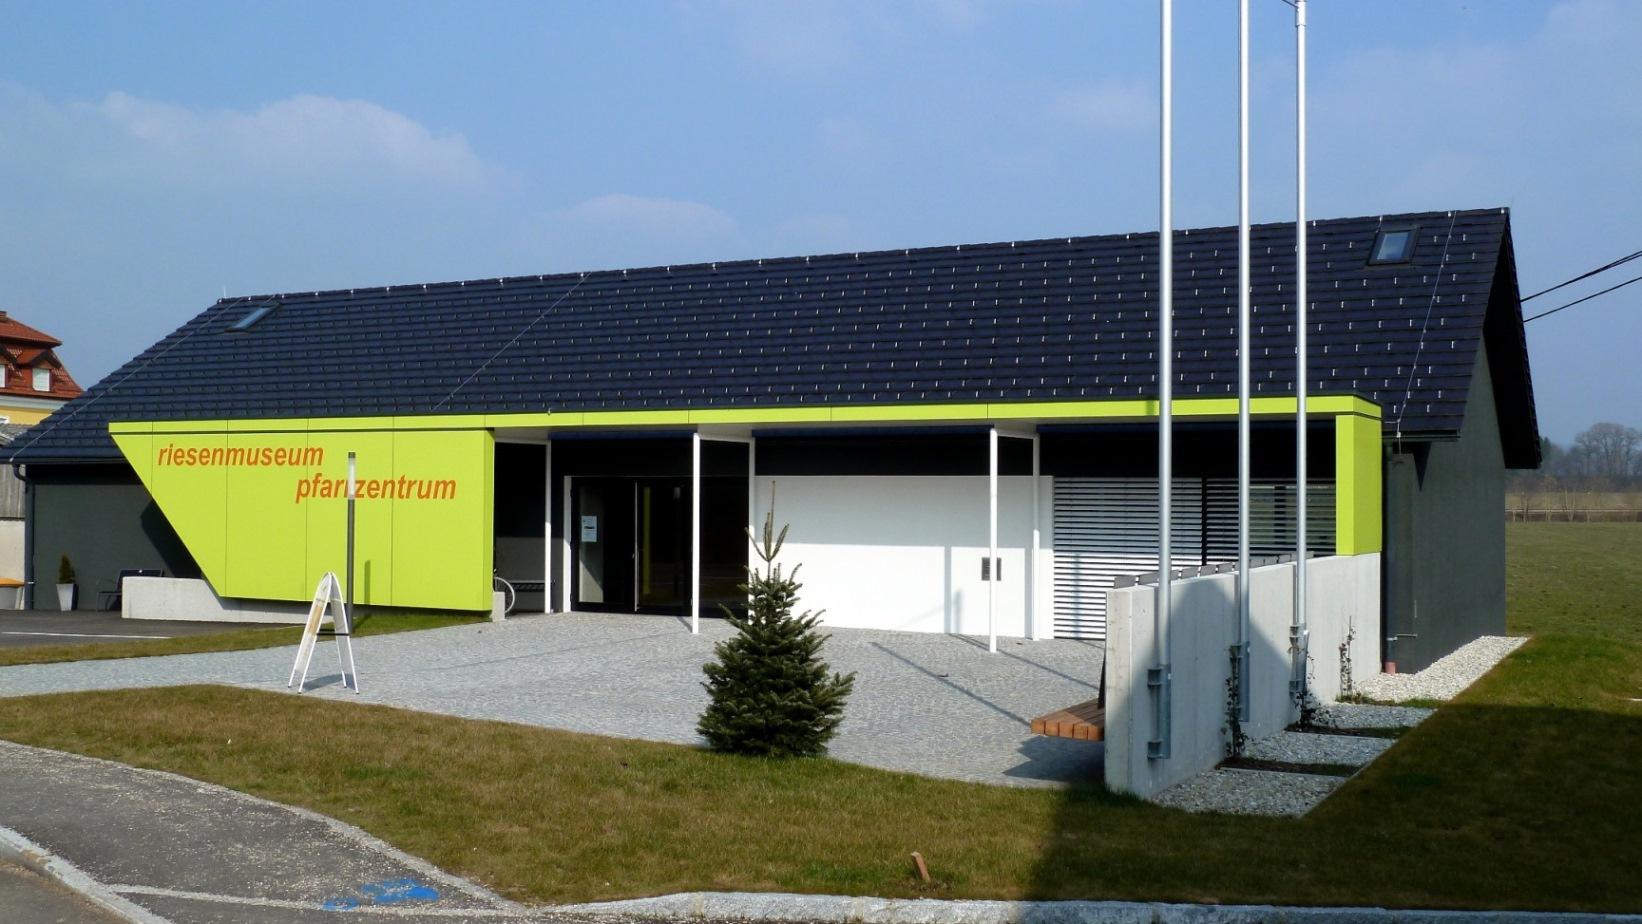 Riesenmuseum